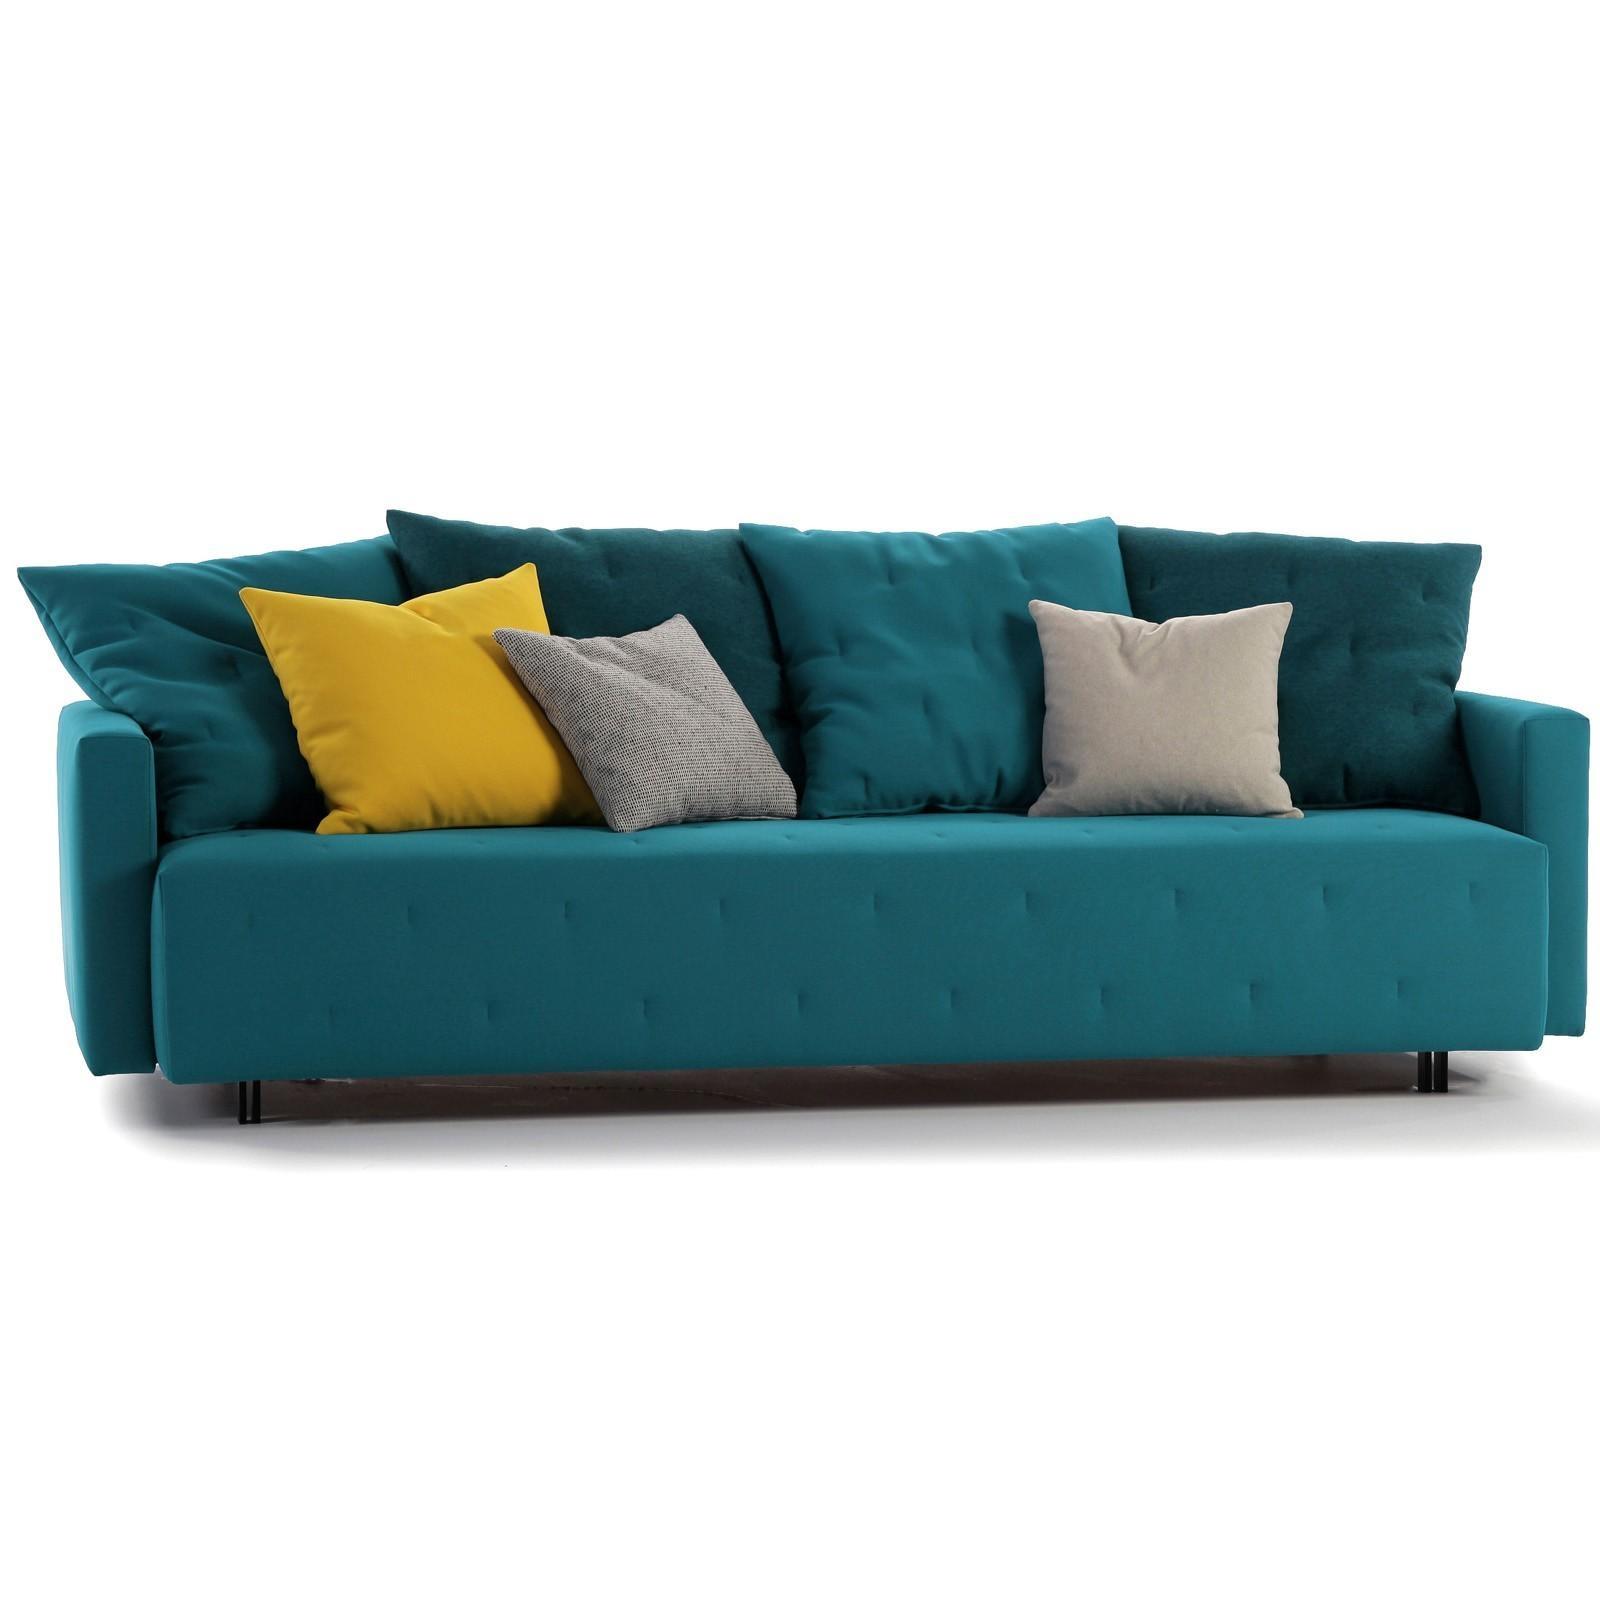 aqua sofa ava velvet tufted sleeper 20 best collection of beds ideas